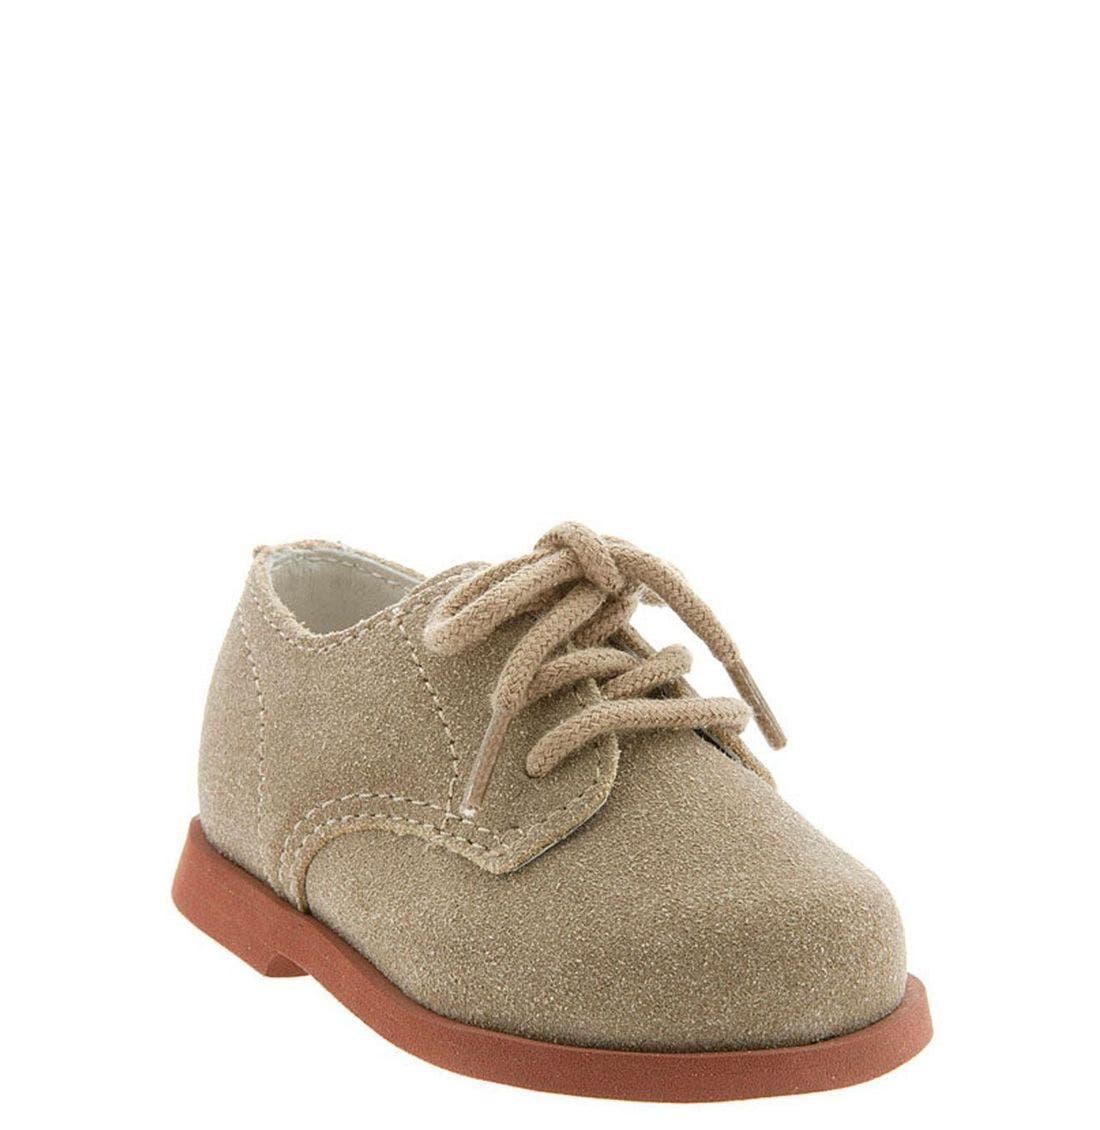 Ralph Lauren Layette Morgan Oxford Crib Shoe Baby